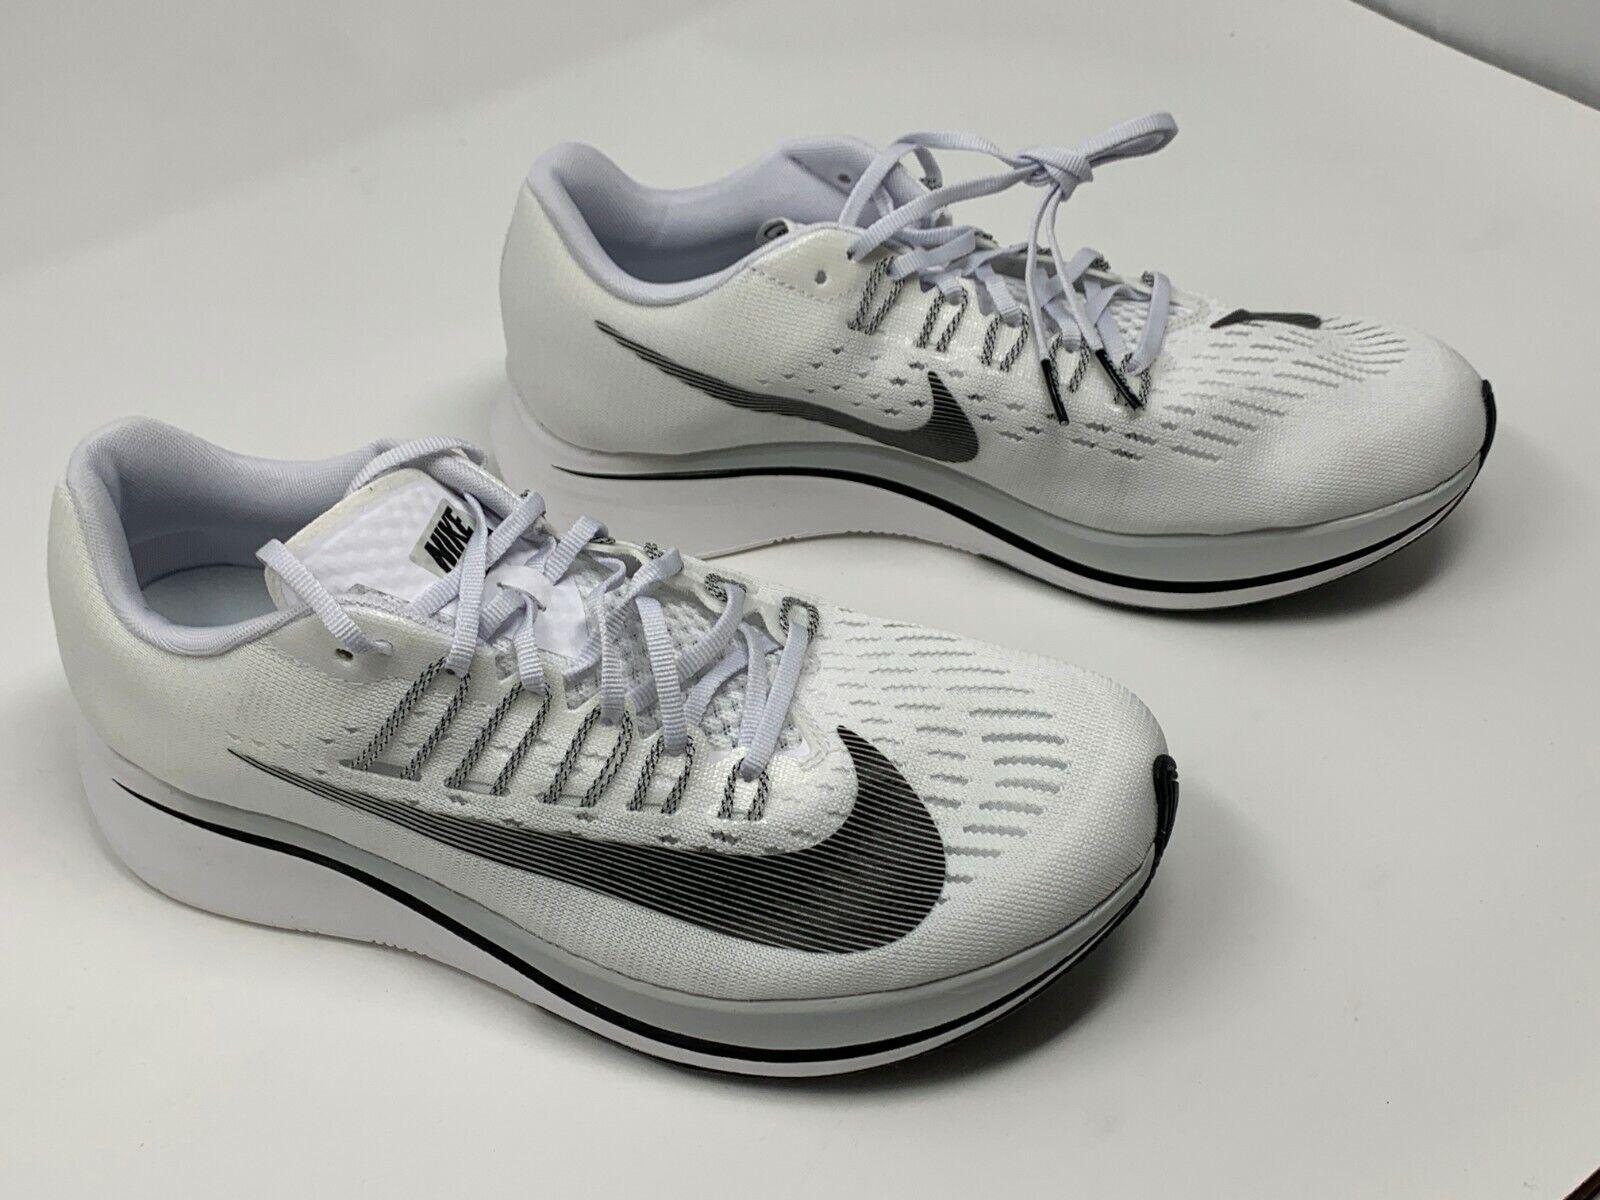 Nike Zoom Fly White Black Black Black Pure Platinum 897821-100 NO BOX TOP Women's SZ 10 1bb323